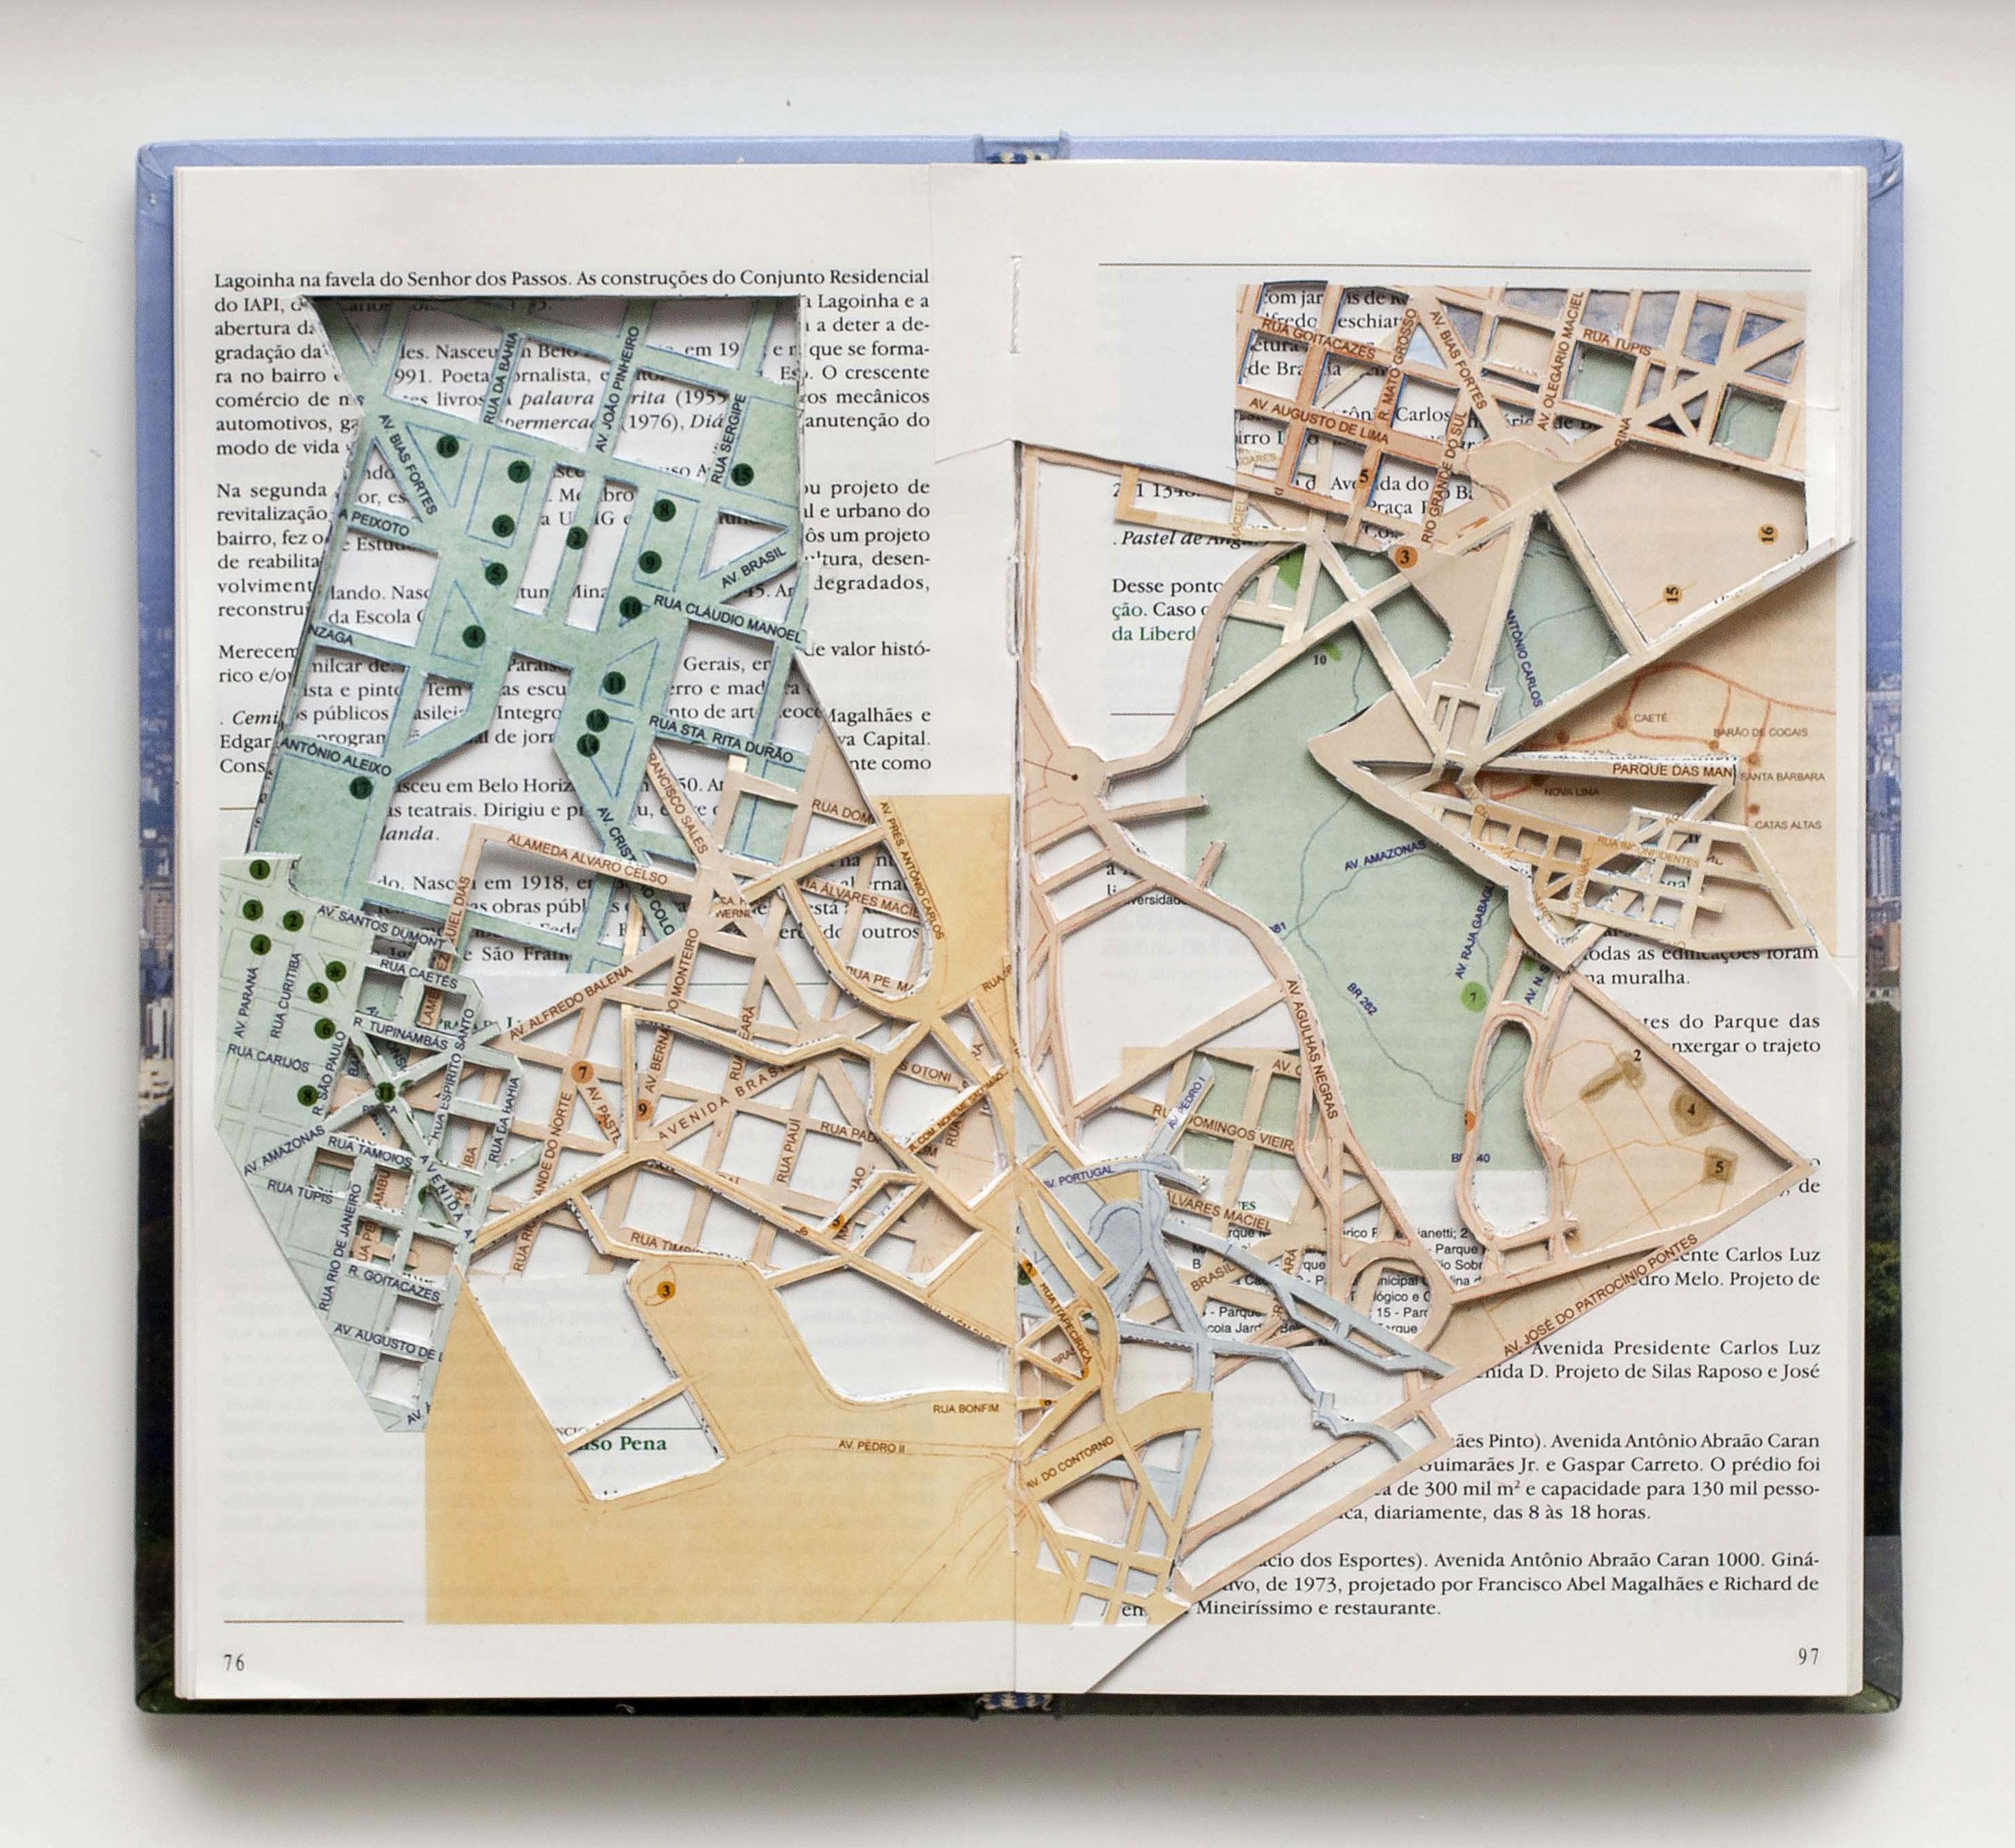 Daniel Escobar - Atlas de Anatomia Urbana   mapas   Pinterest ...